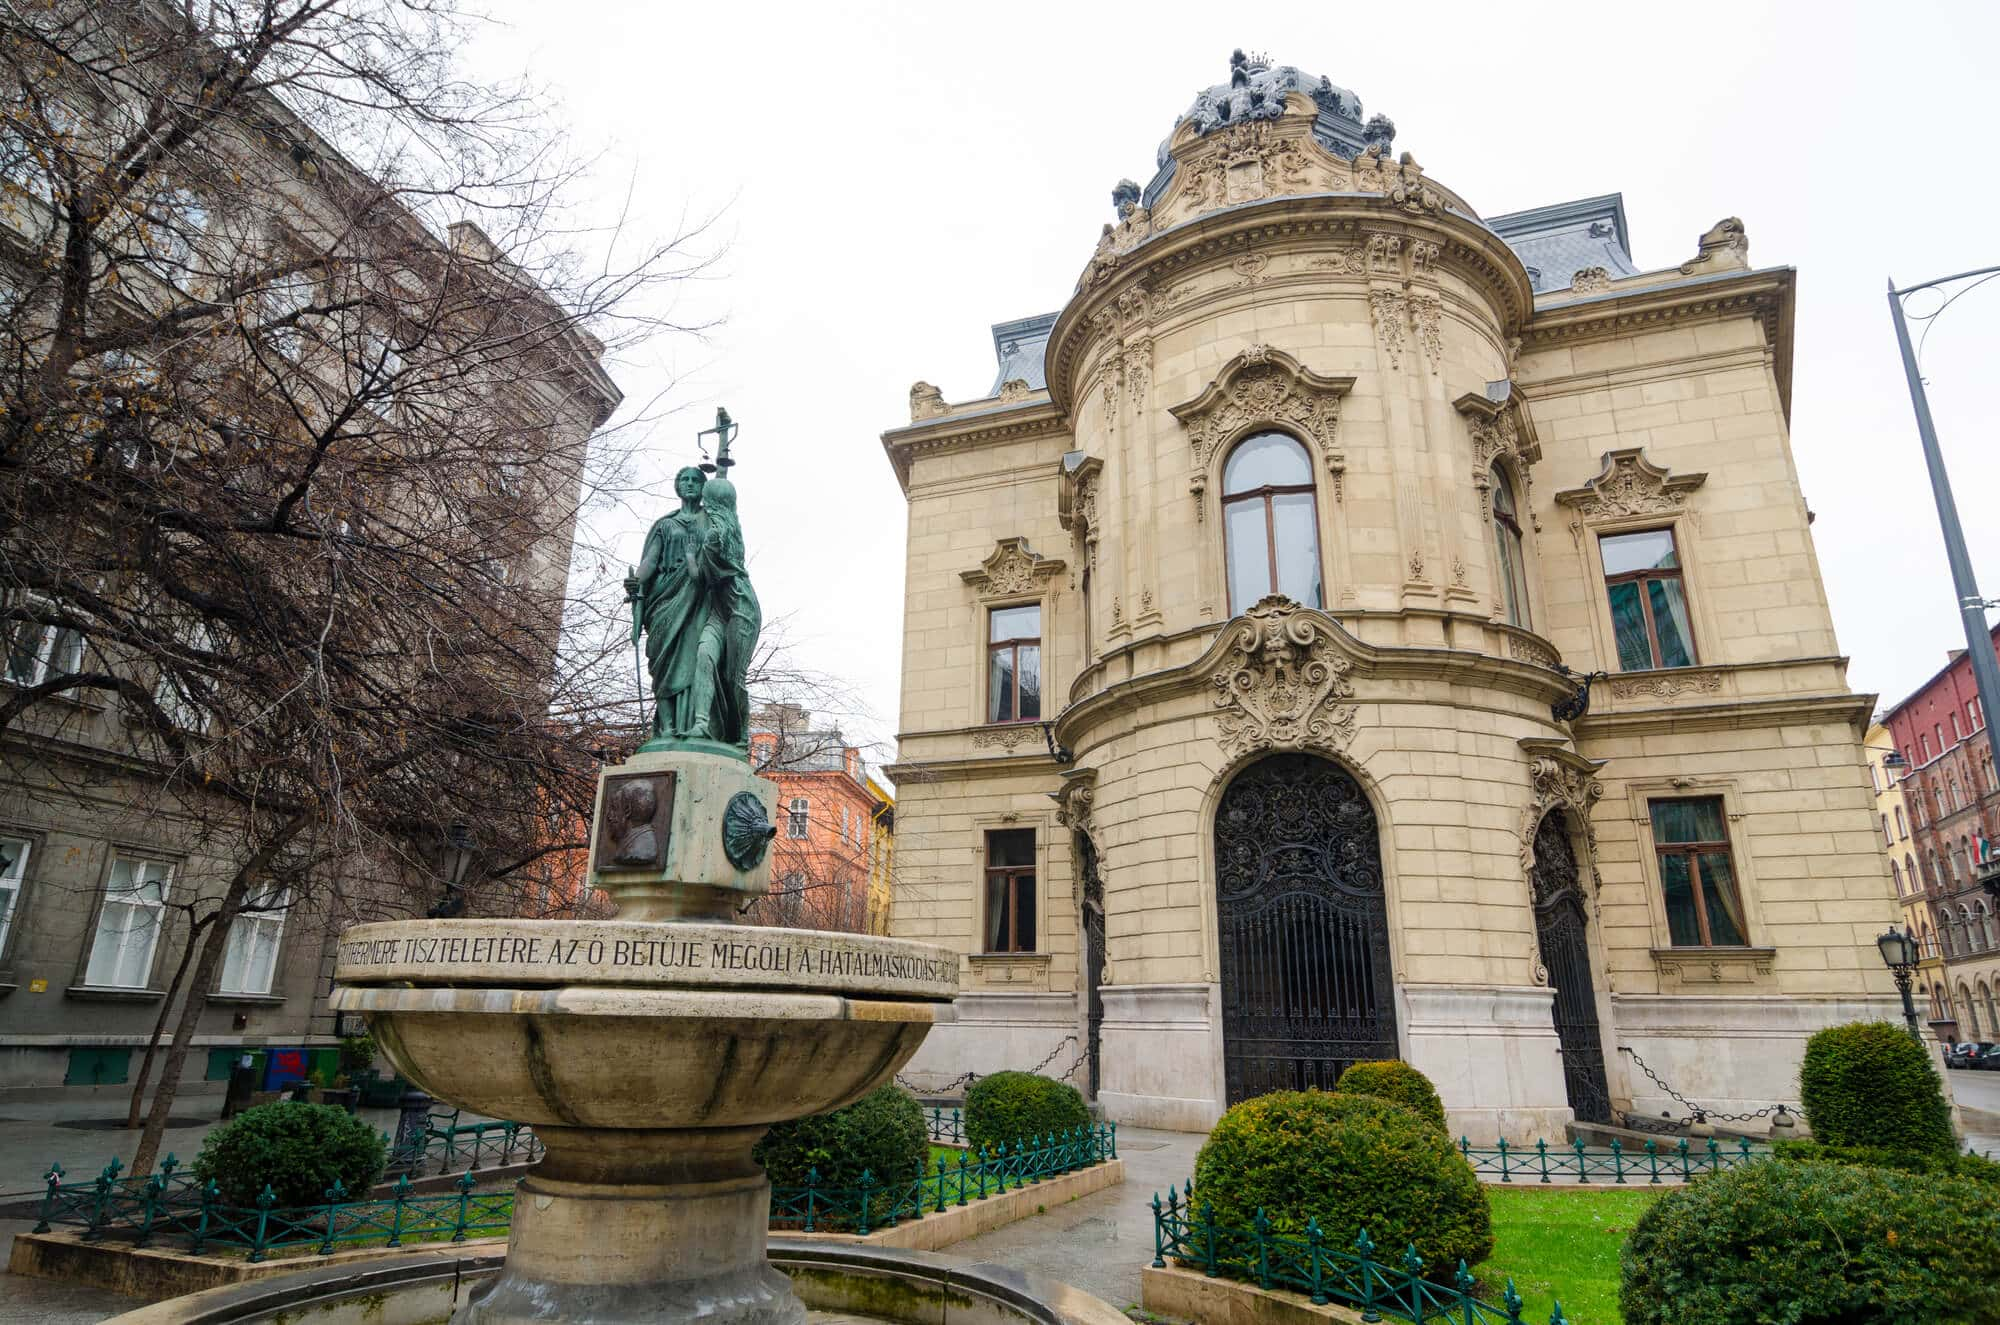 Budapest Instagram photo guide - Metropolitan Ervin Szabó Library